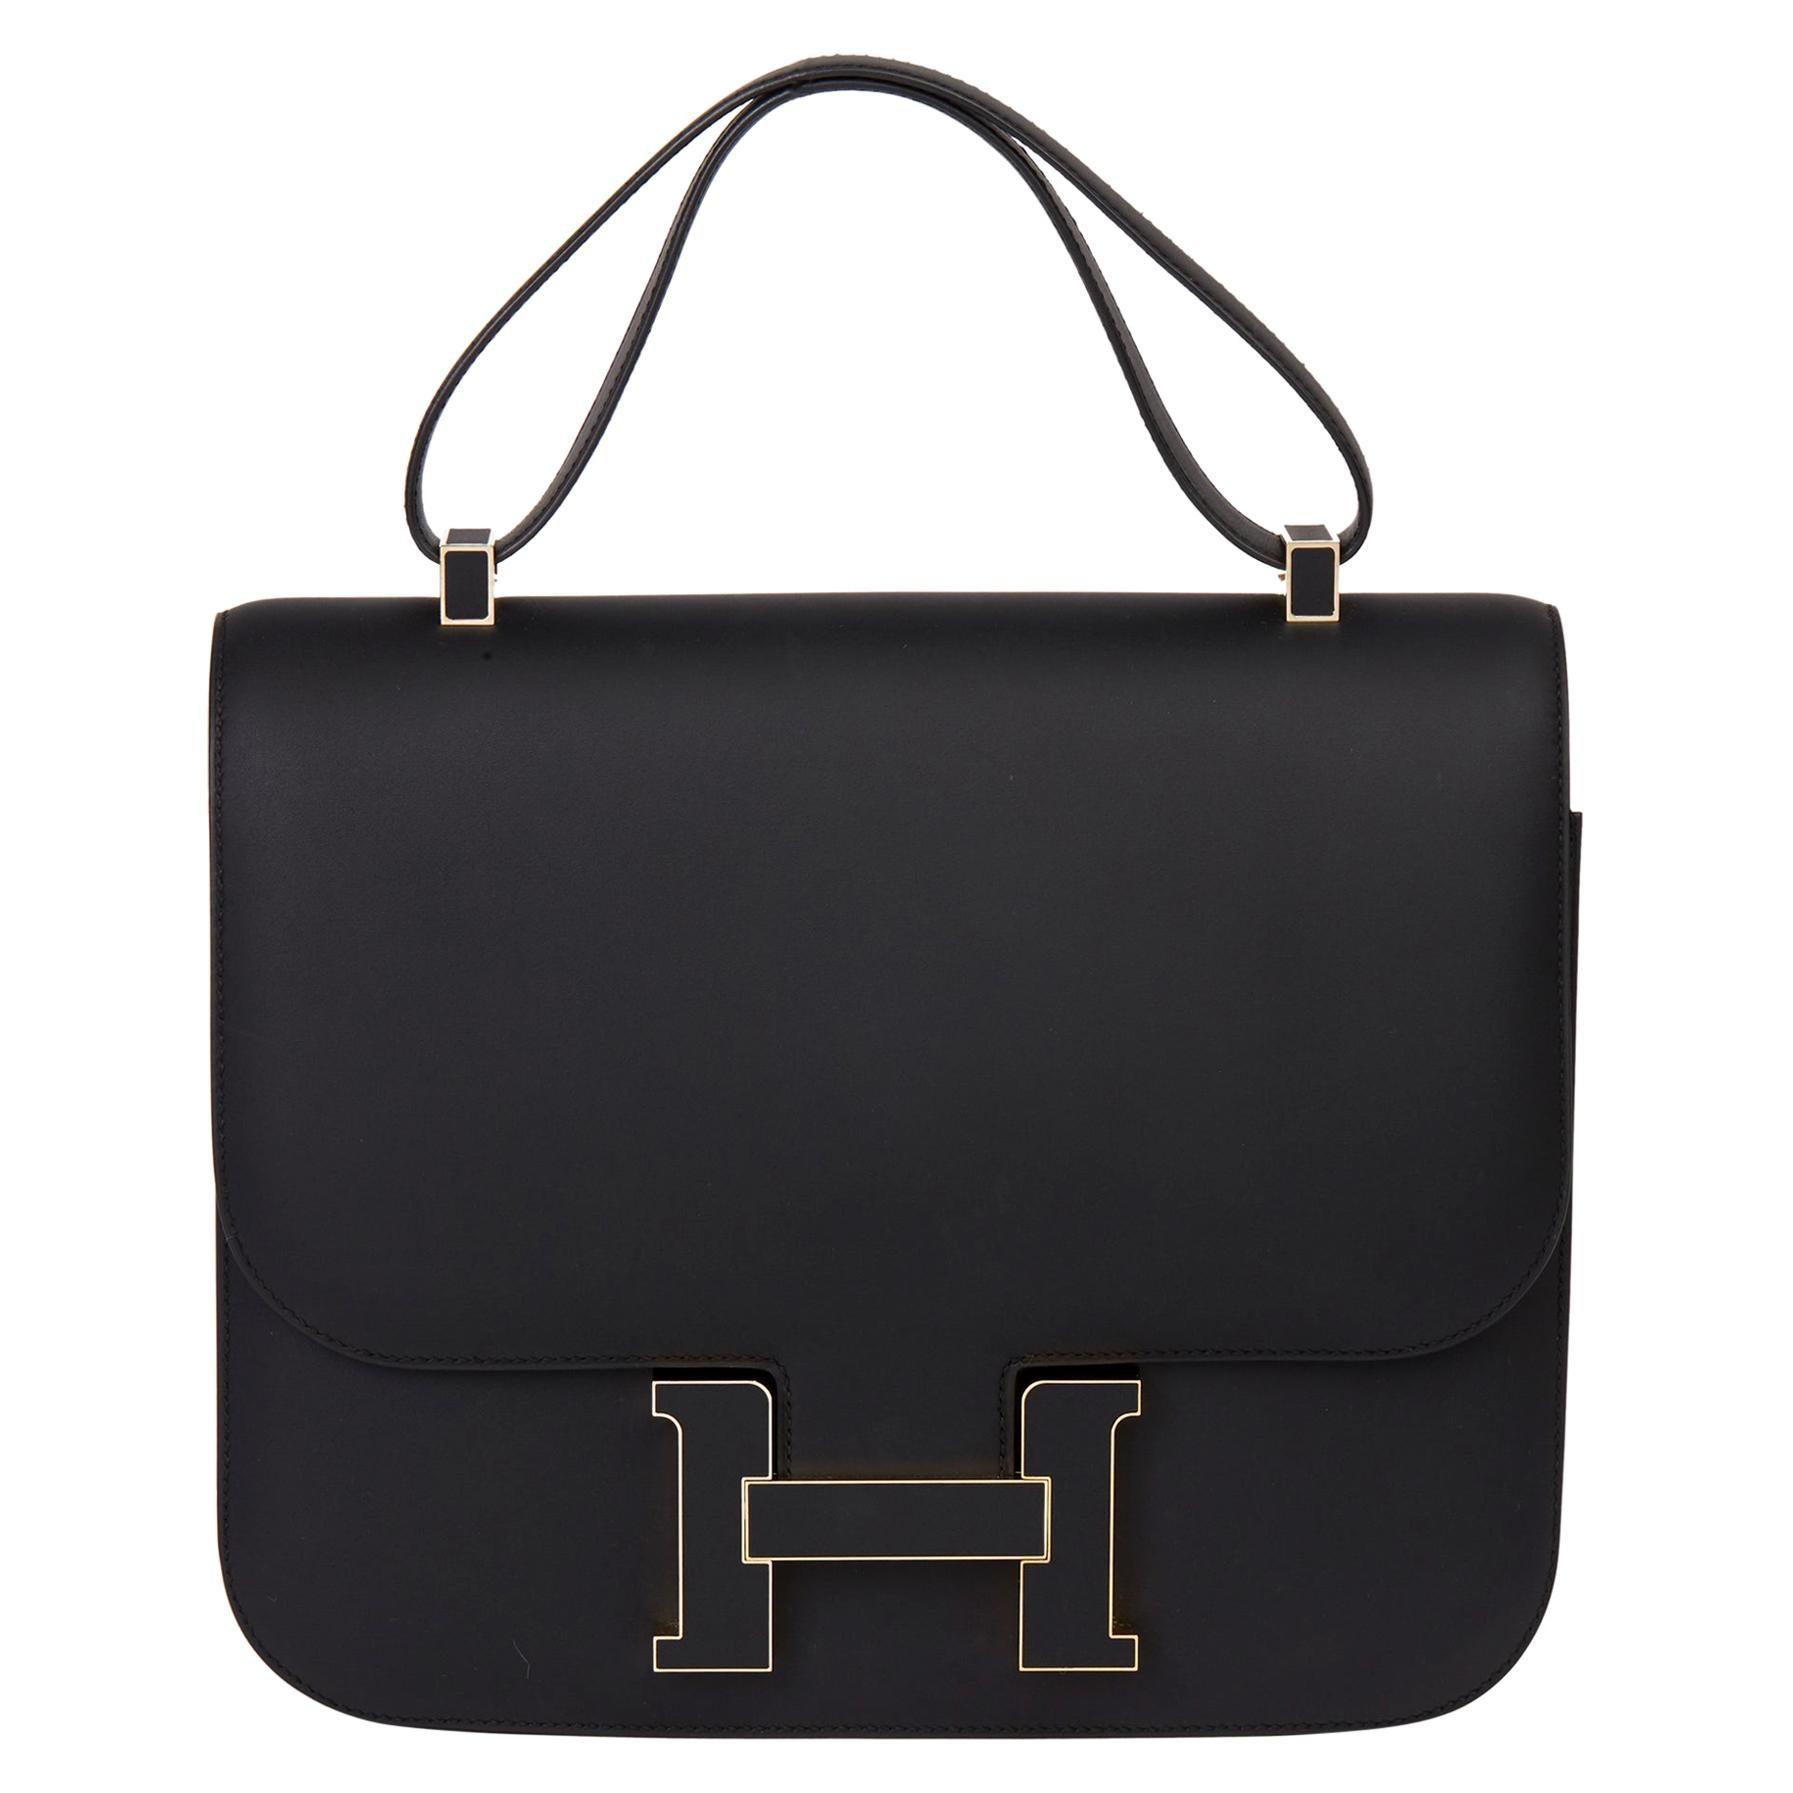 2019 Hermès Black Sombrero Leather Constance Cartable